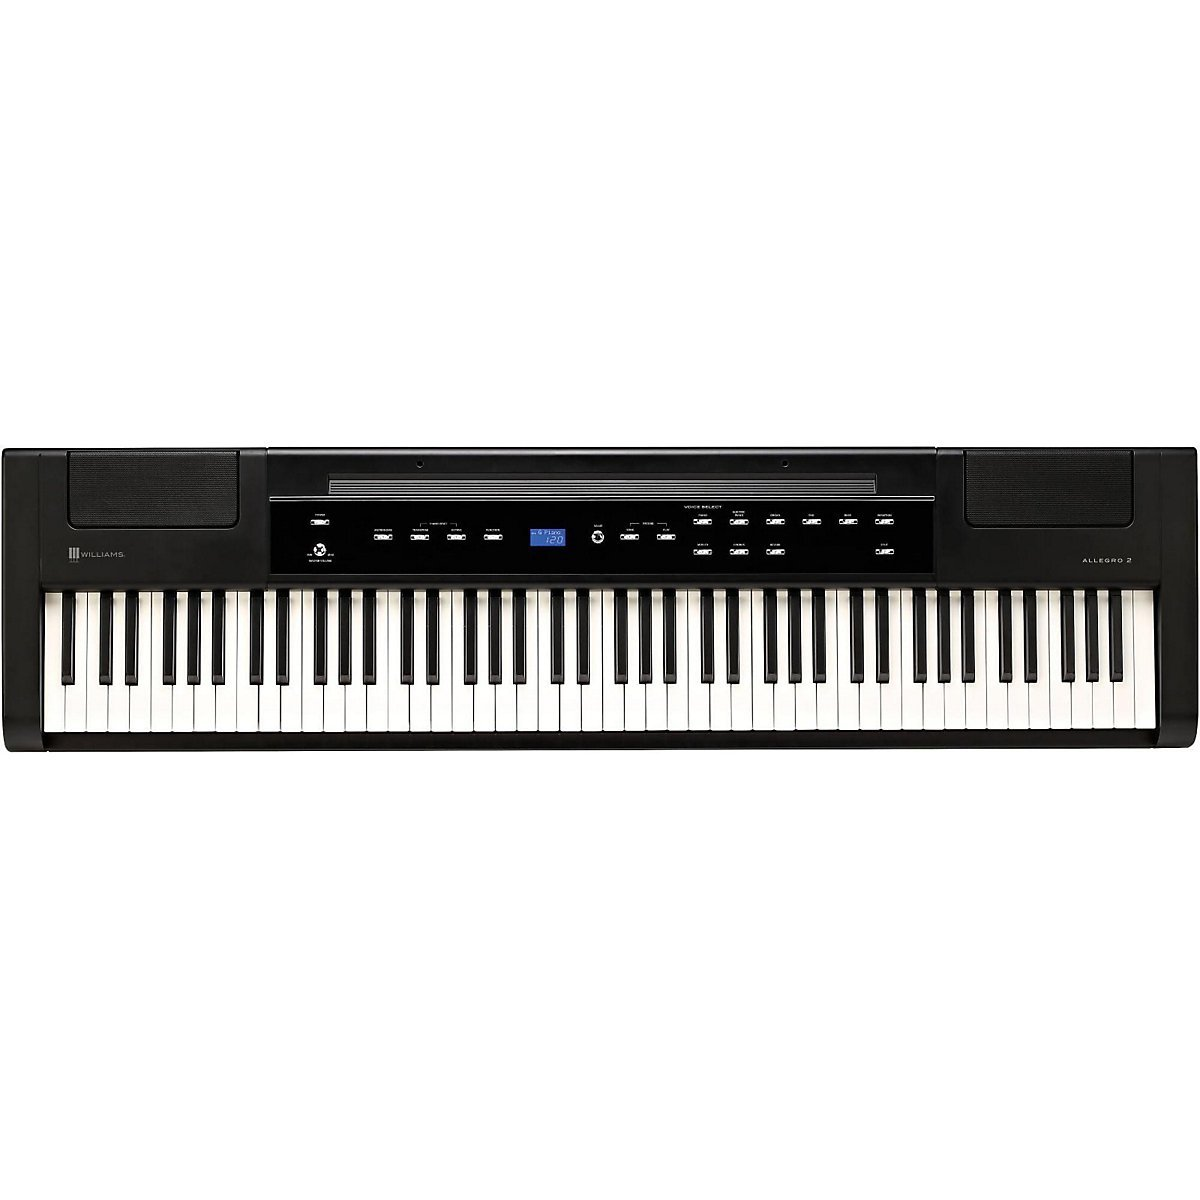 88 Key Piano >> Williams Allegro 2 Digital Piano Review - Best Digital Piano